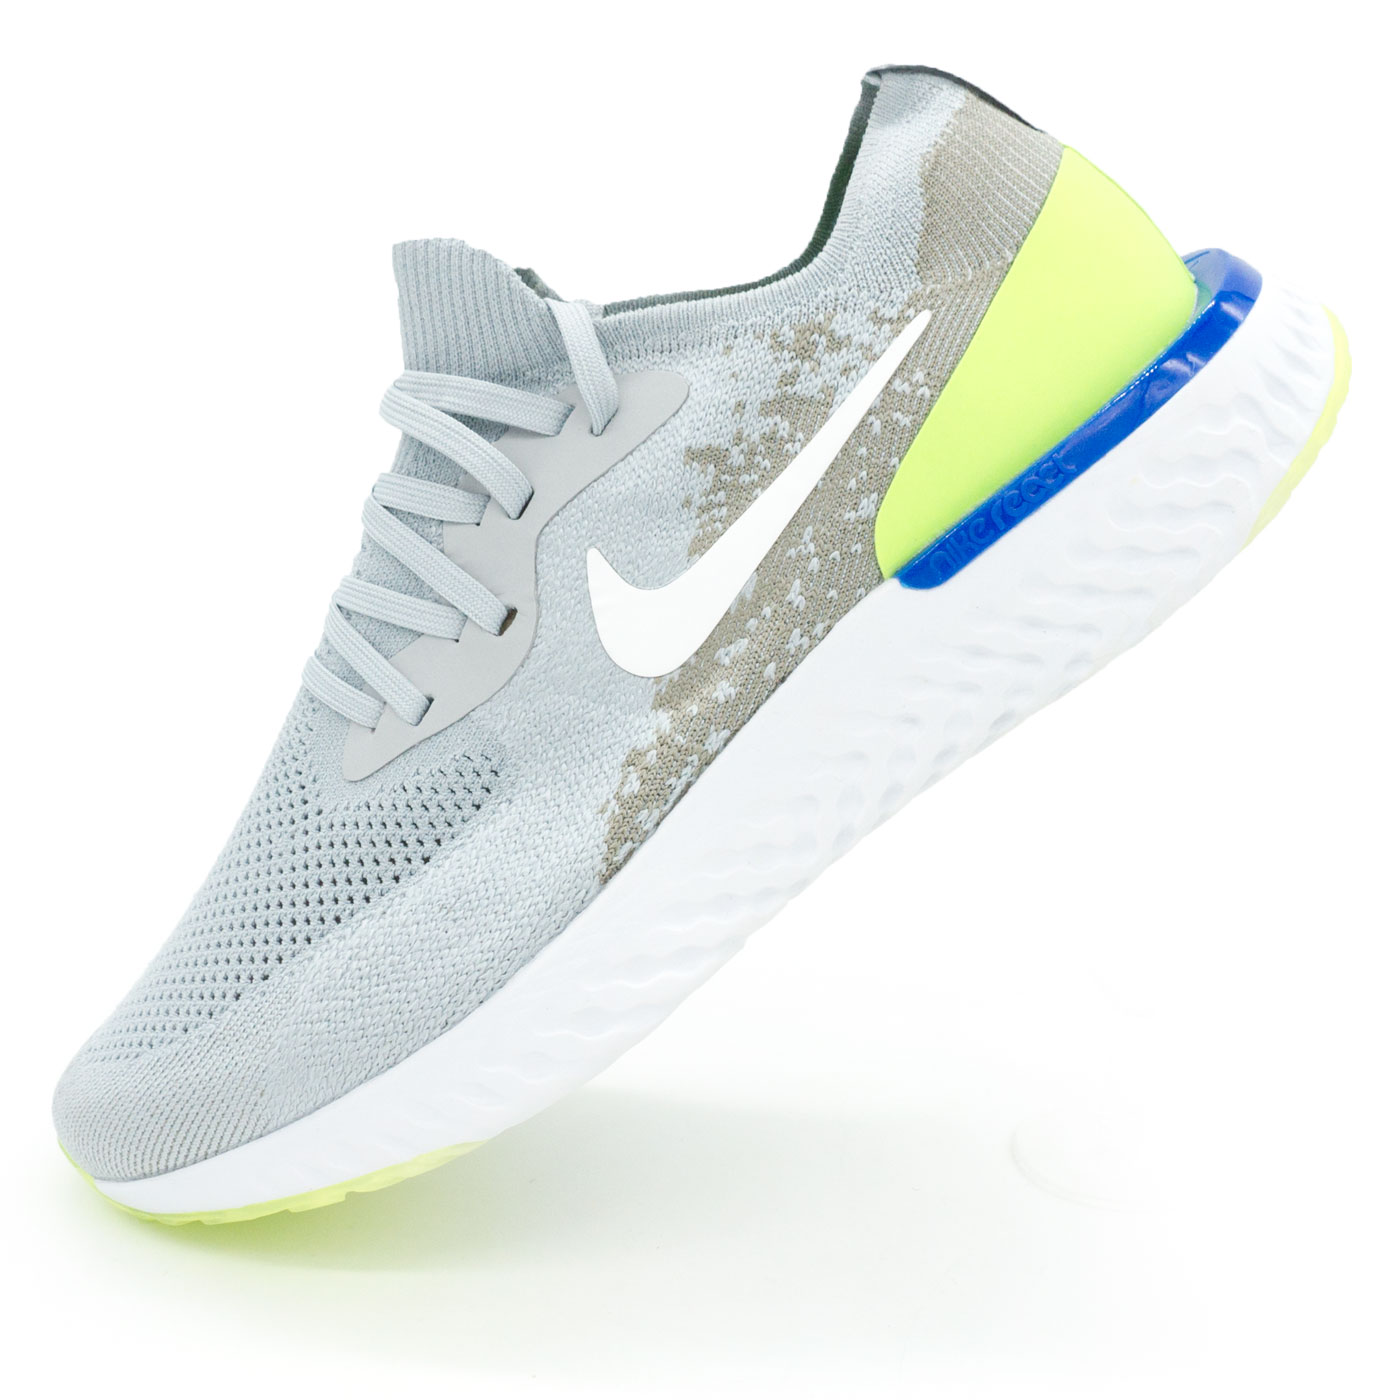 фото main Мужские кроссовки для бега Nike Epic React Flyknit серые. Топ качество! main